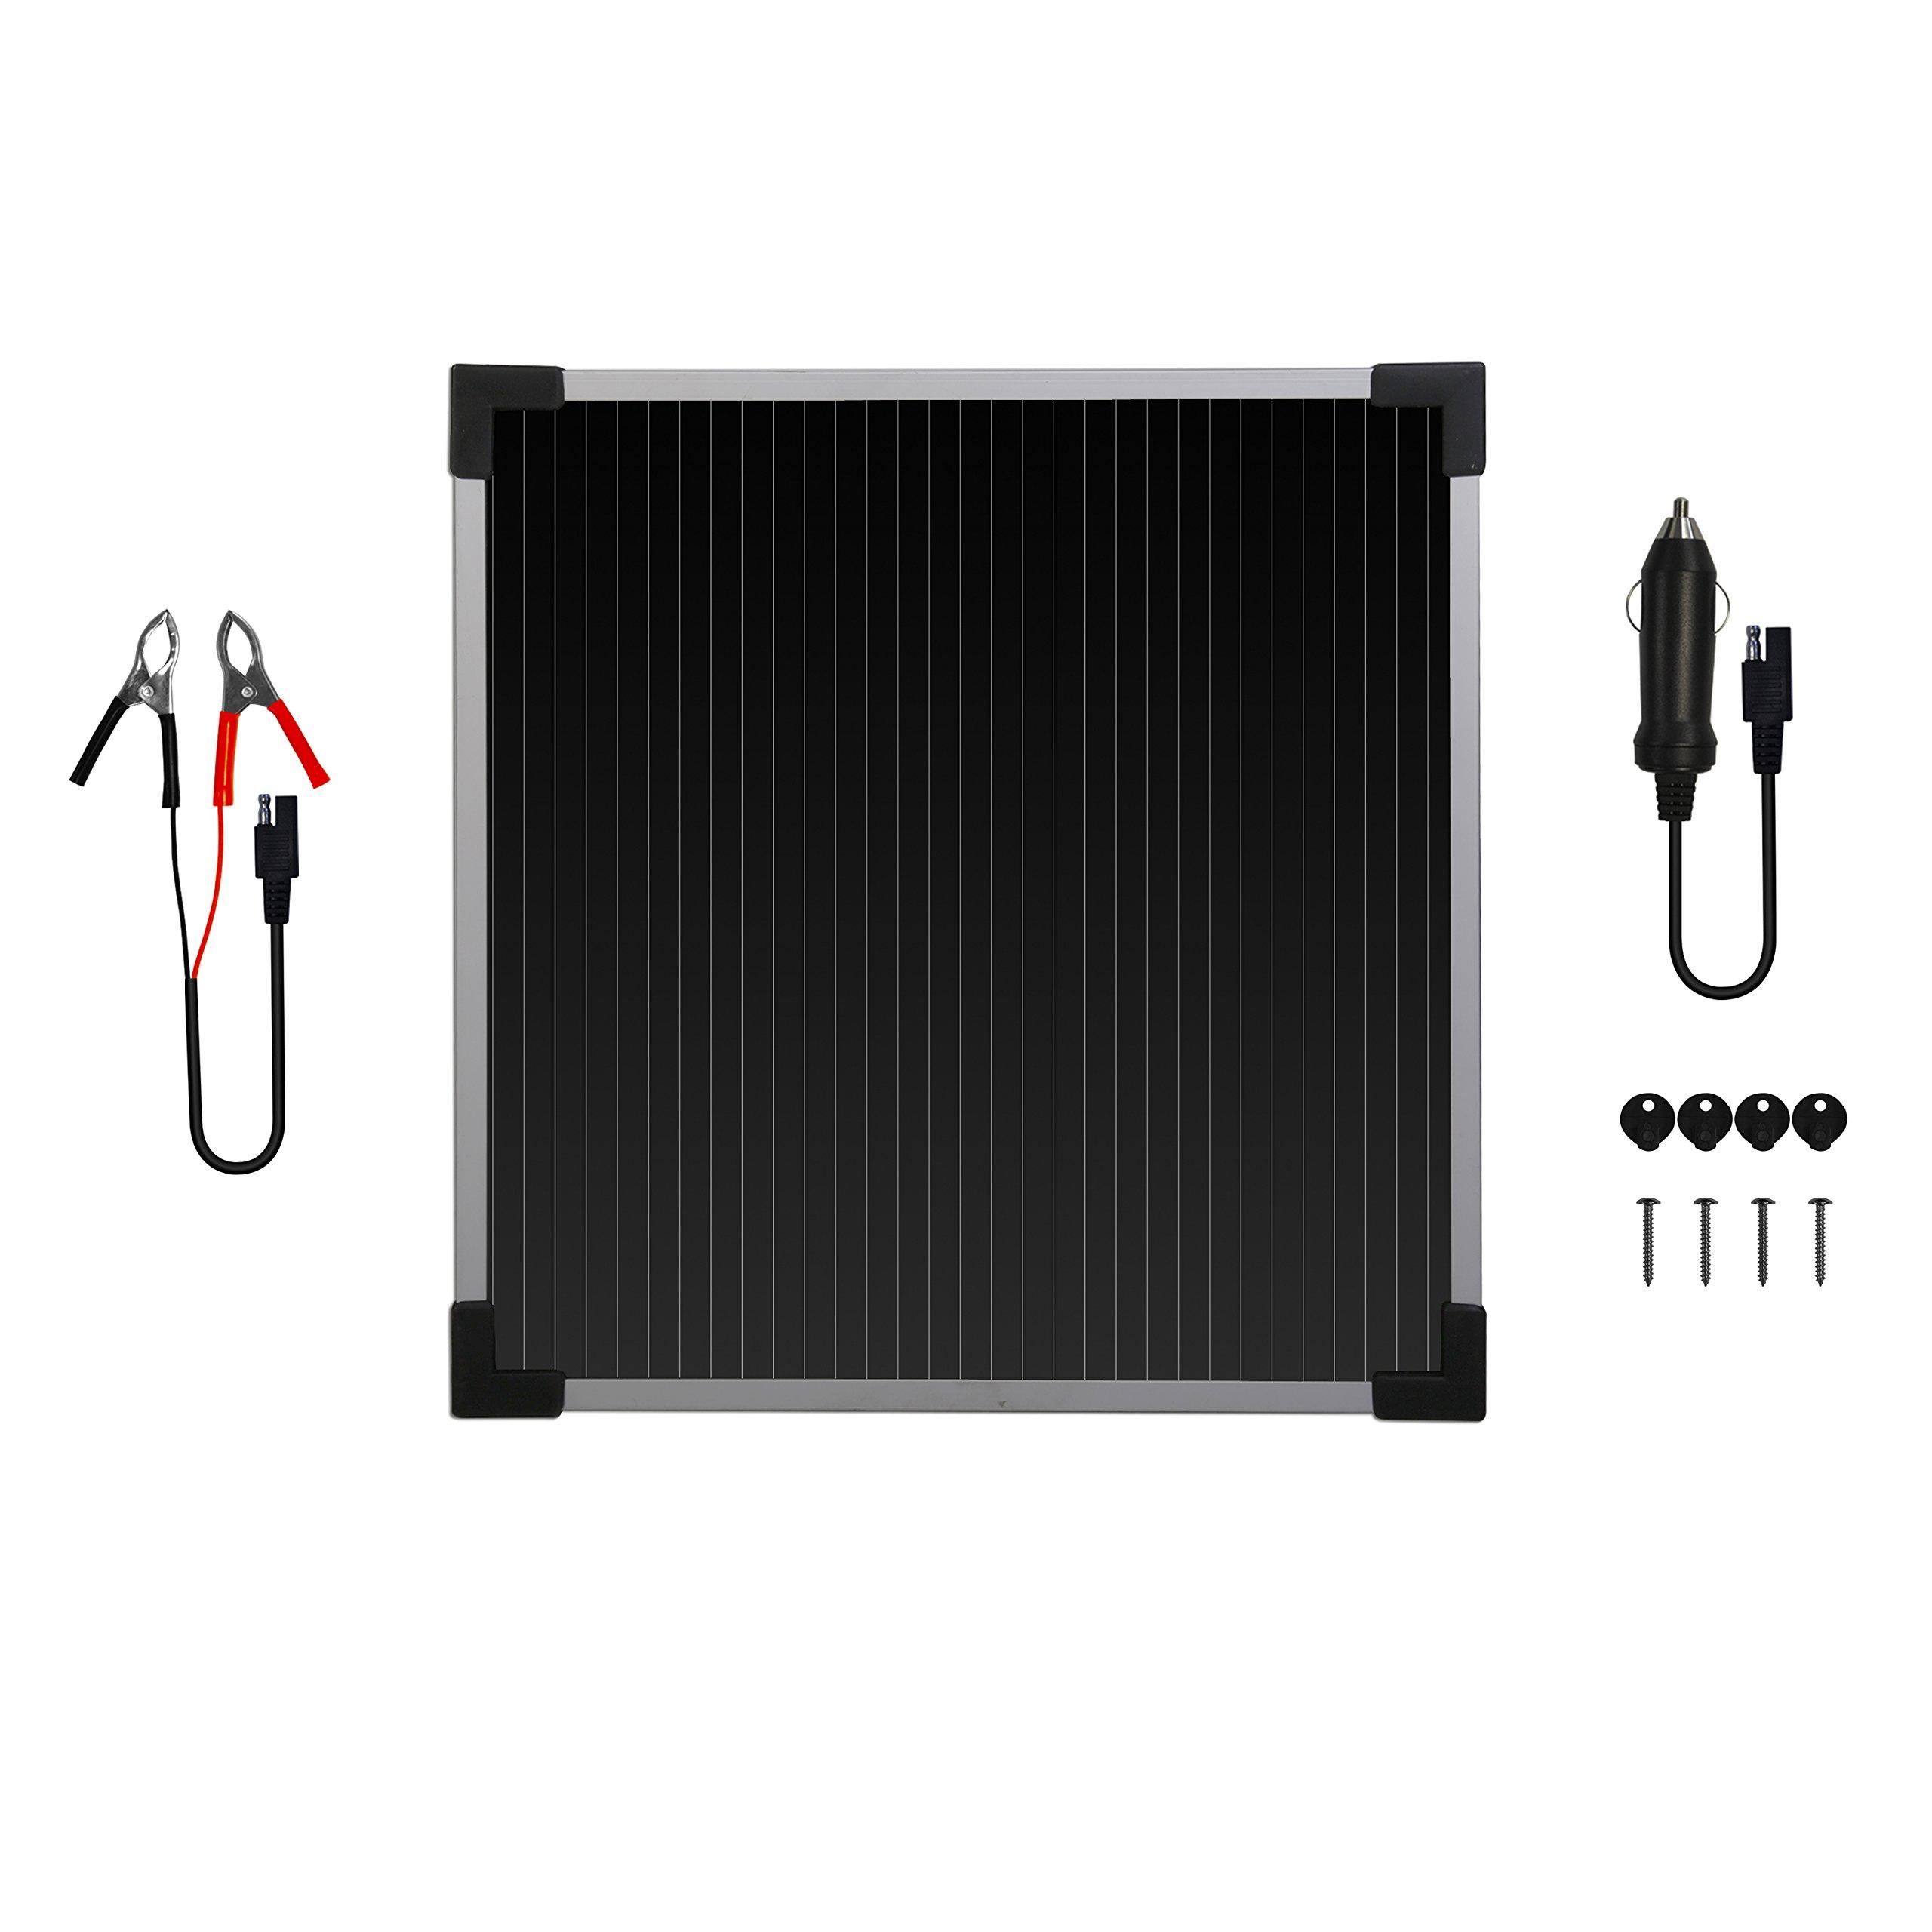 Sunforce 50022 5-Watt Solar Battery Trickle Charger by Sunforce (Image #2)